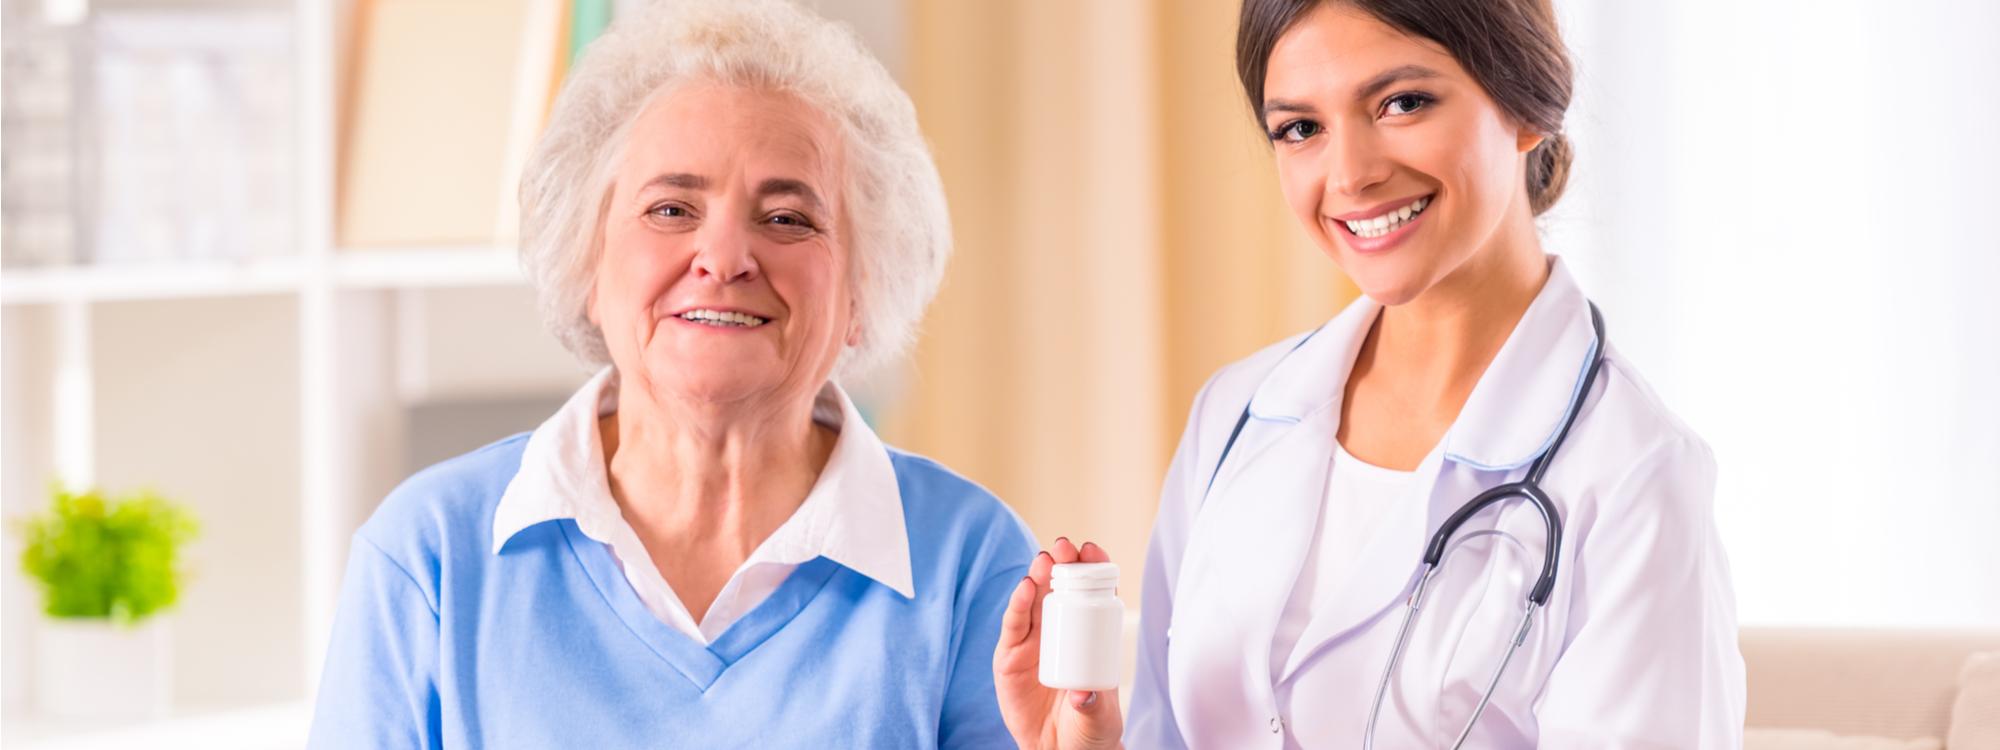 Medical Malpractice Insurance Massachusetts